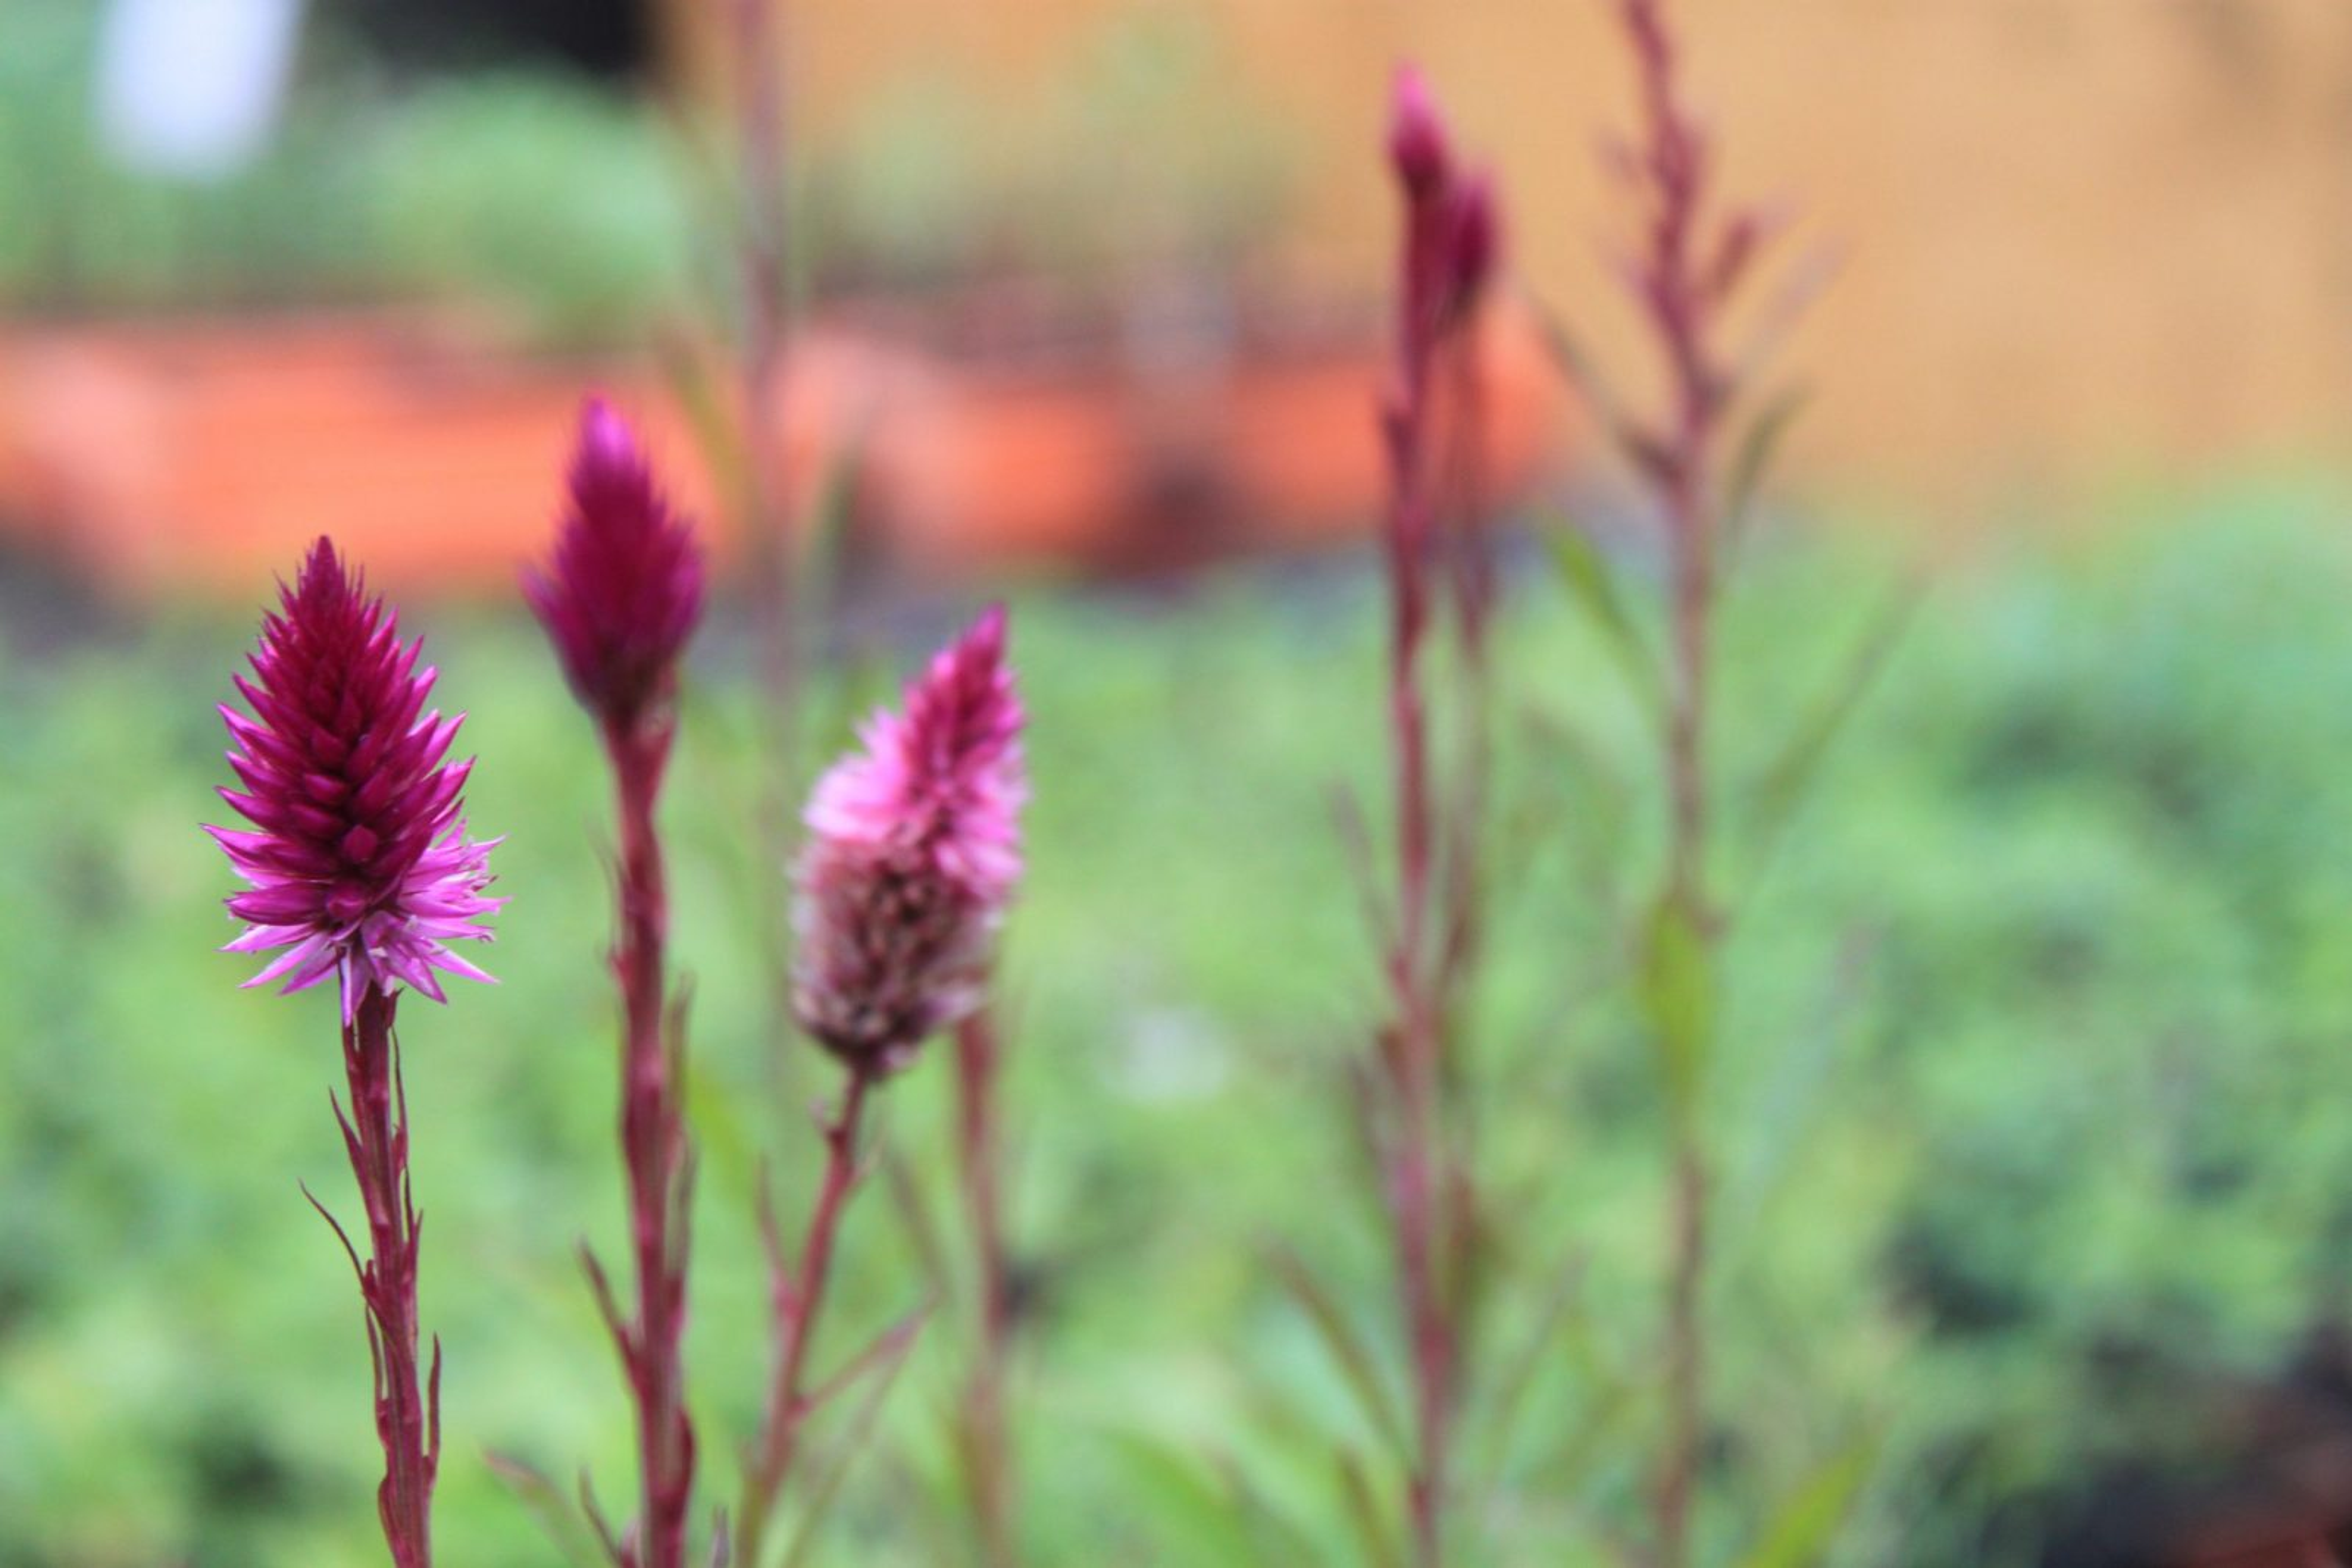 Agora é época de: celosia (Celosia argentea L.)